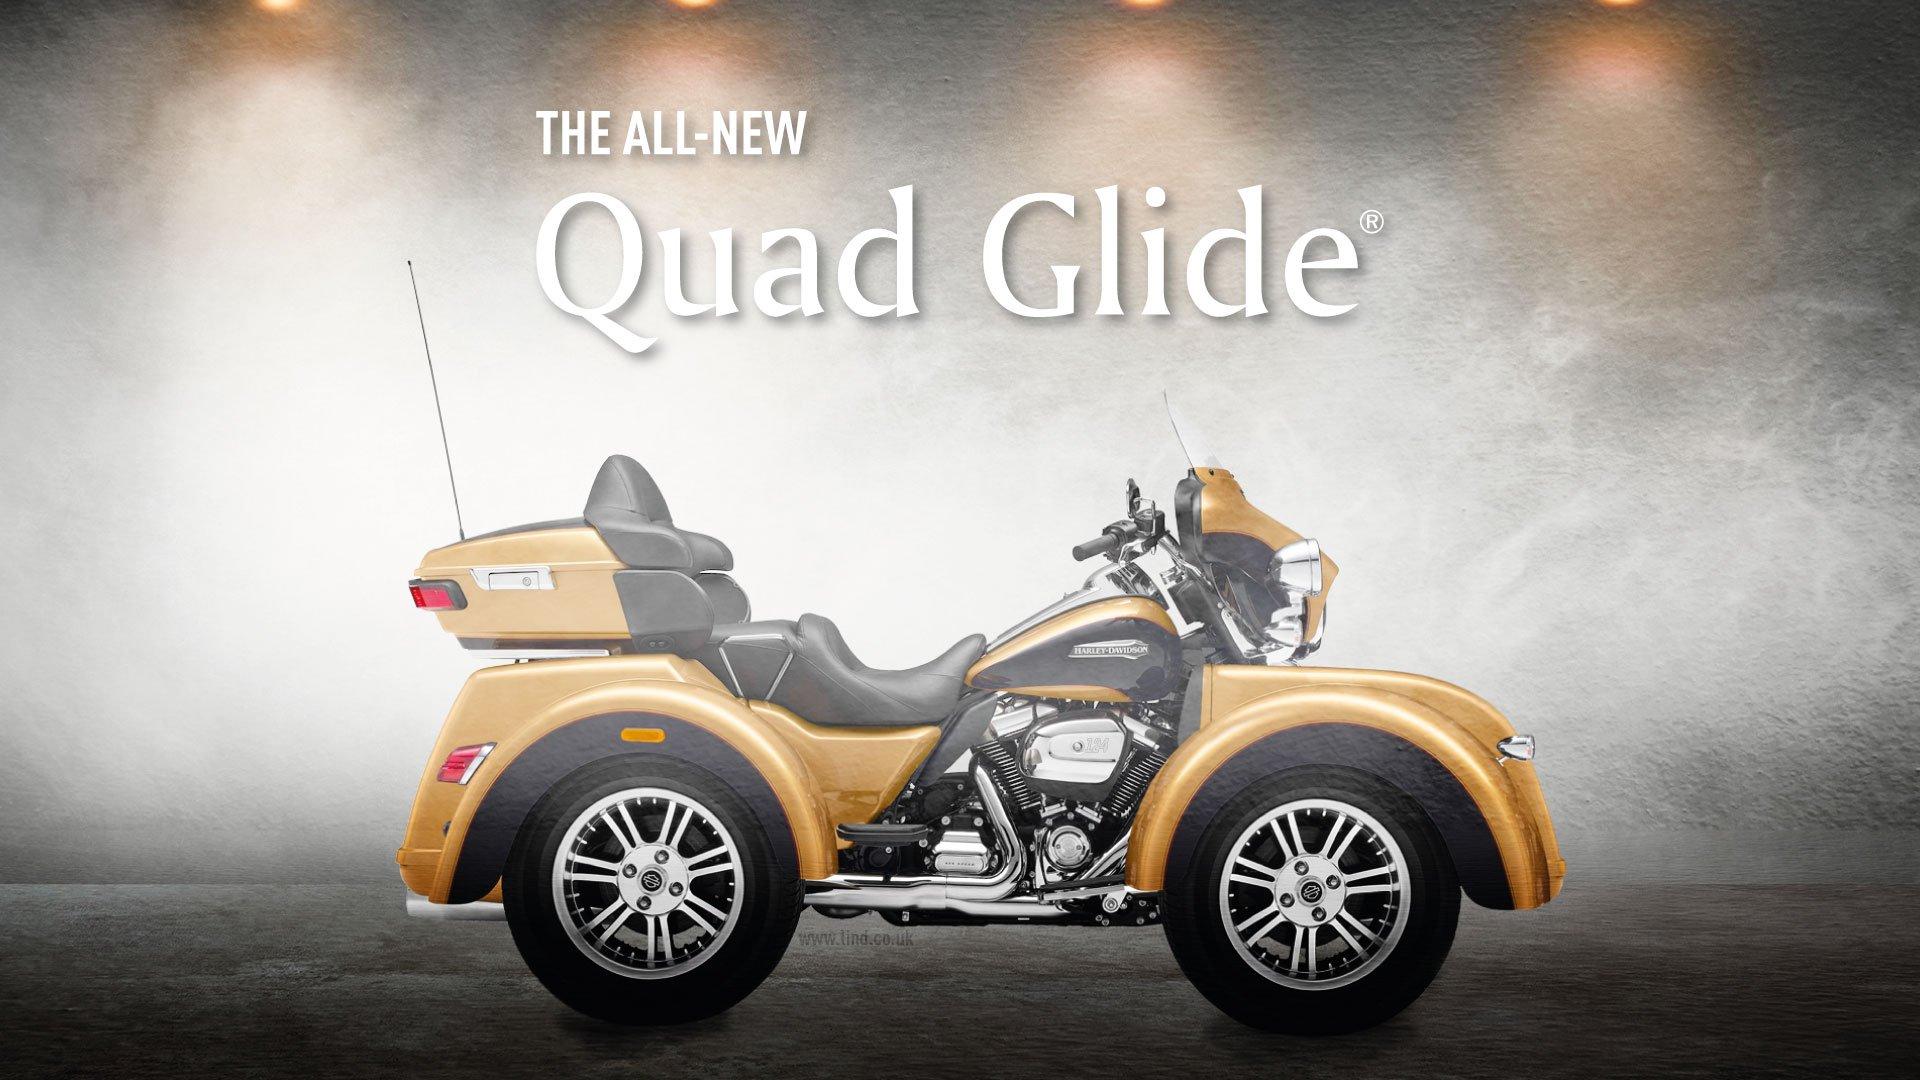 All-New Quad Glide